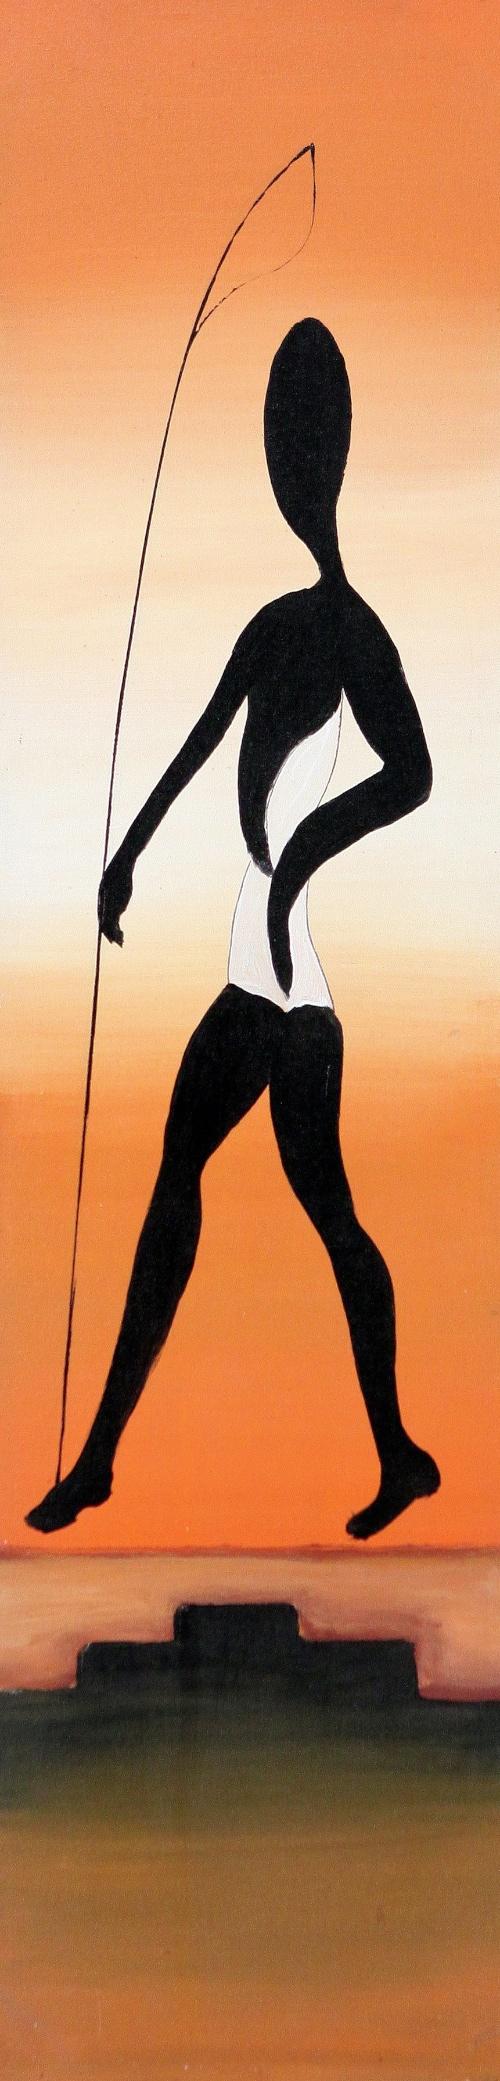 The Fisherman by Wardika Original Art